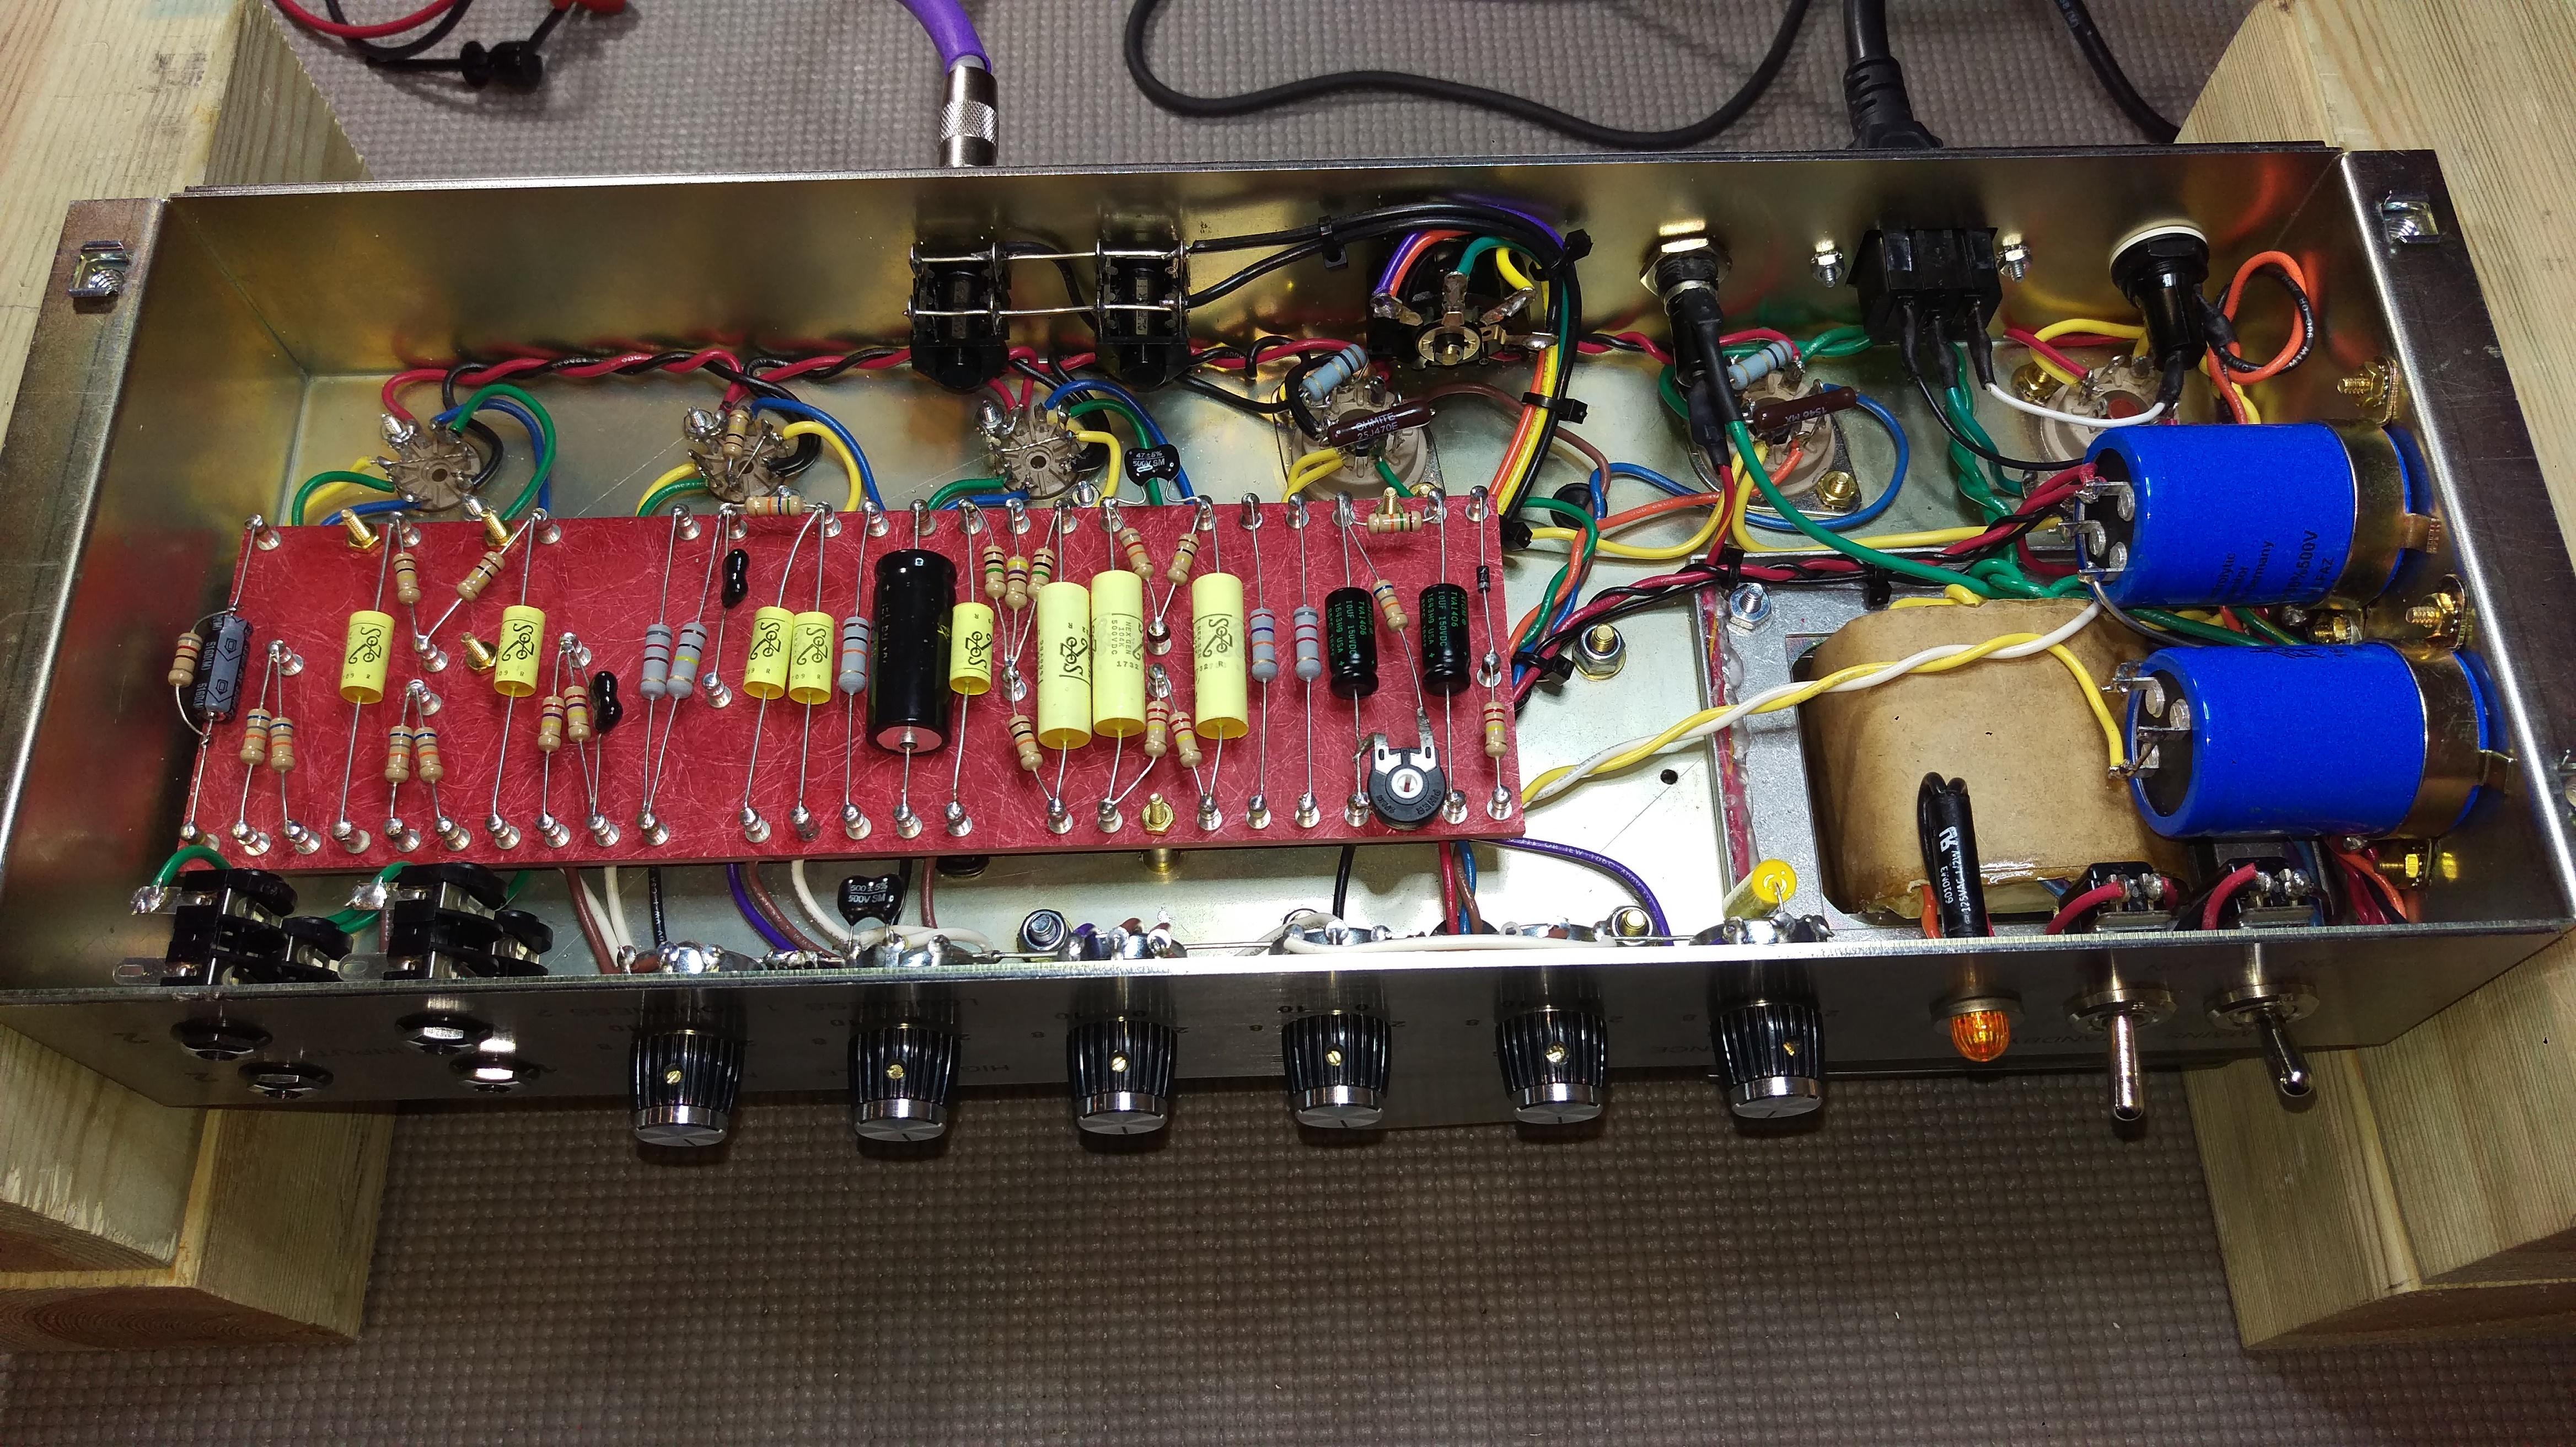 TIO-45 Handwired Guitar Amplifier